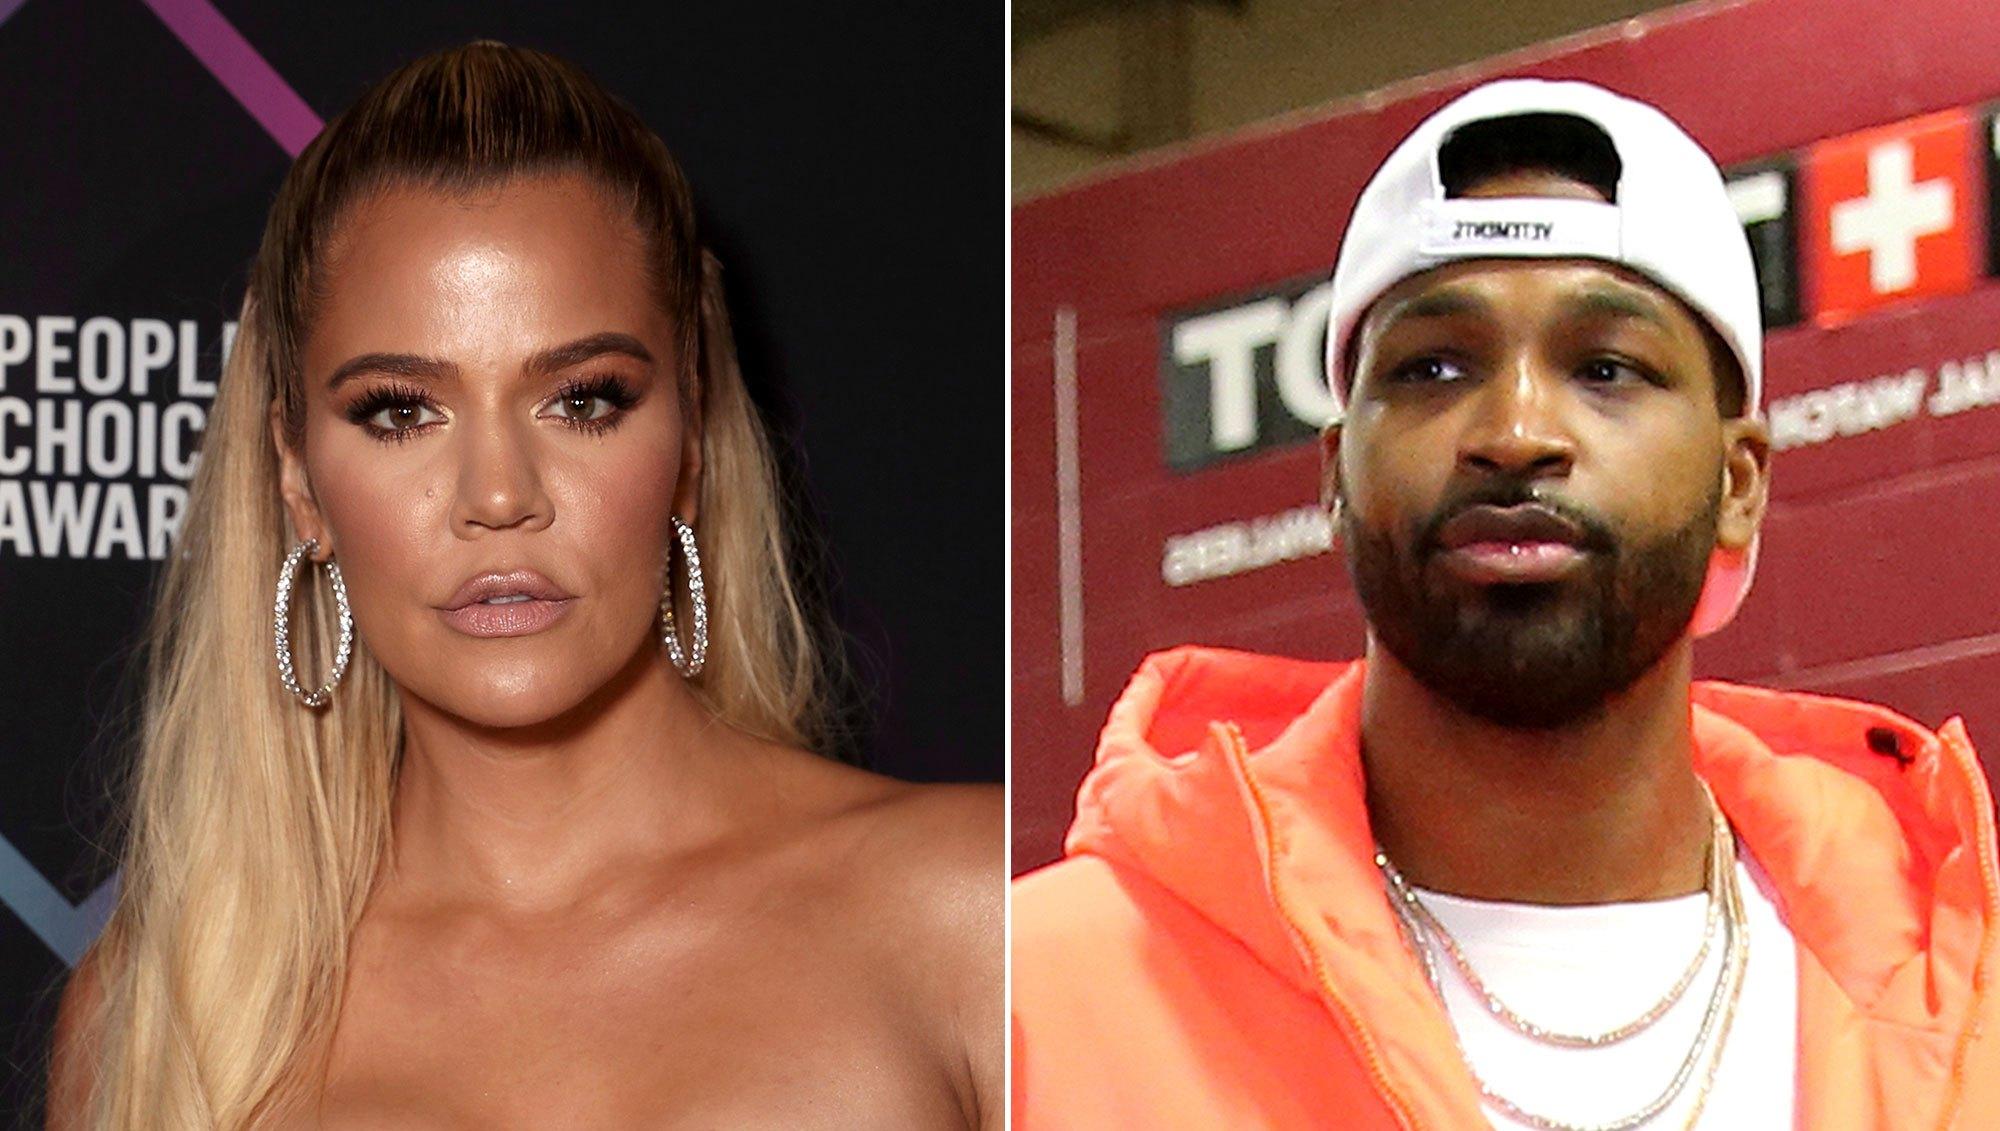 Khloe Kardashian Posts Cryptic Messges Amid Tristan Split Rumors